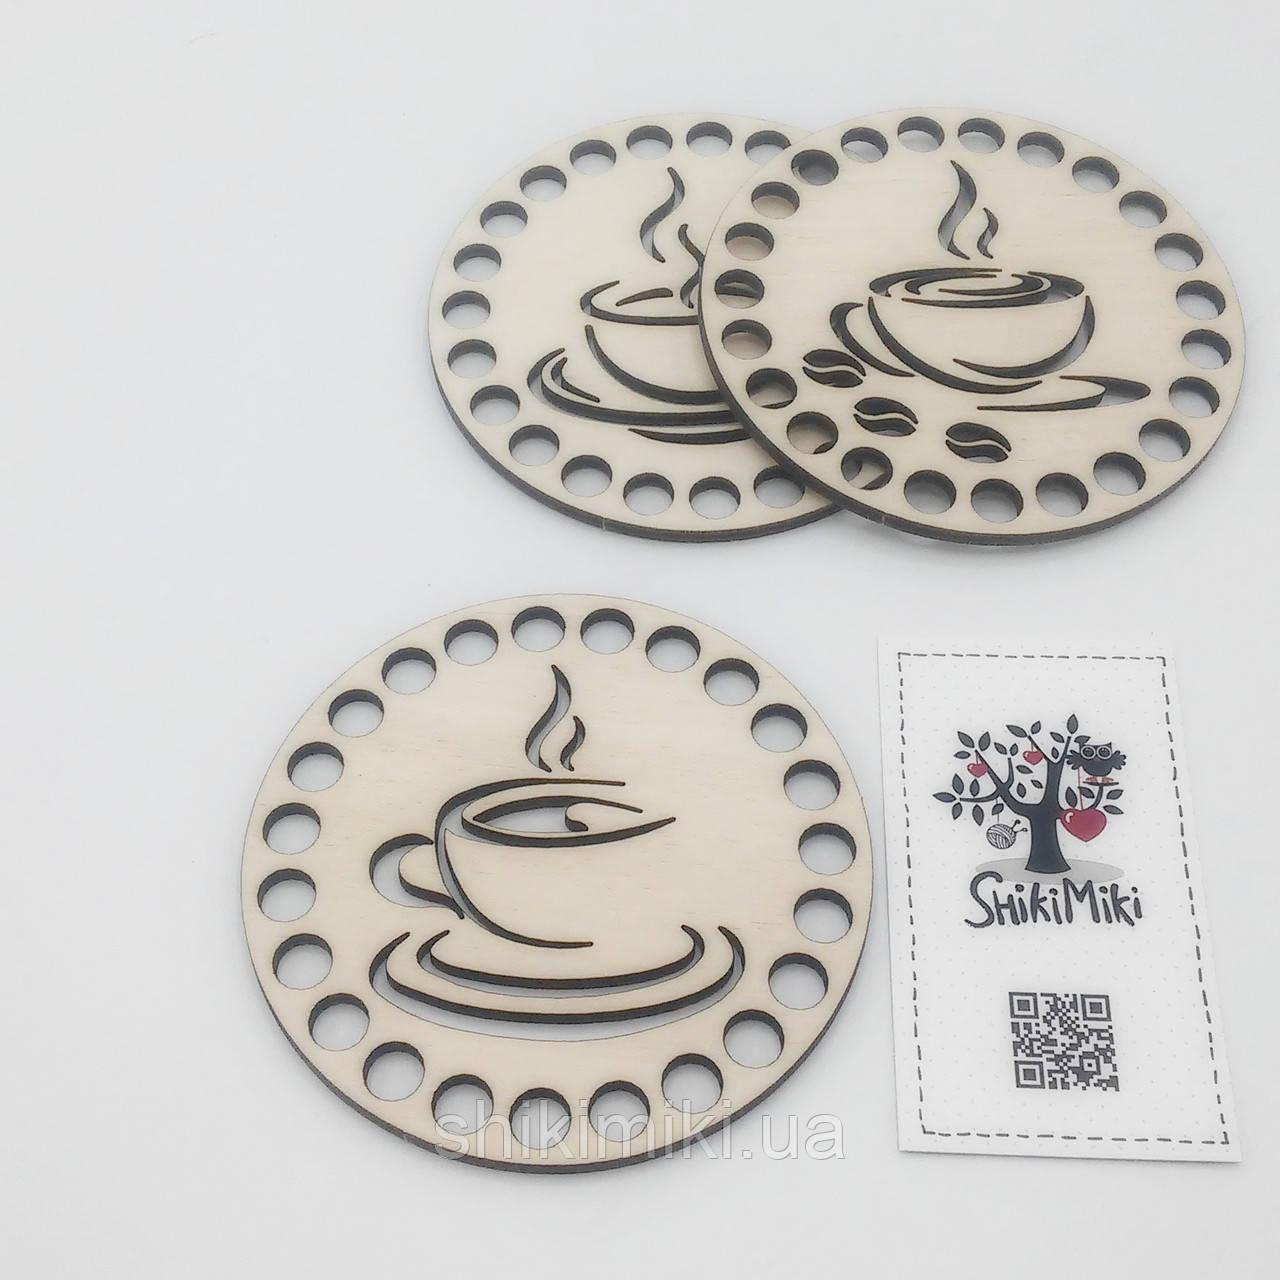 "Заготовка-подставка из фанеры круглая ""Coffee-3"" (10 см)"